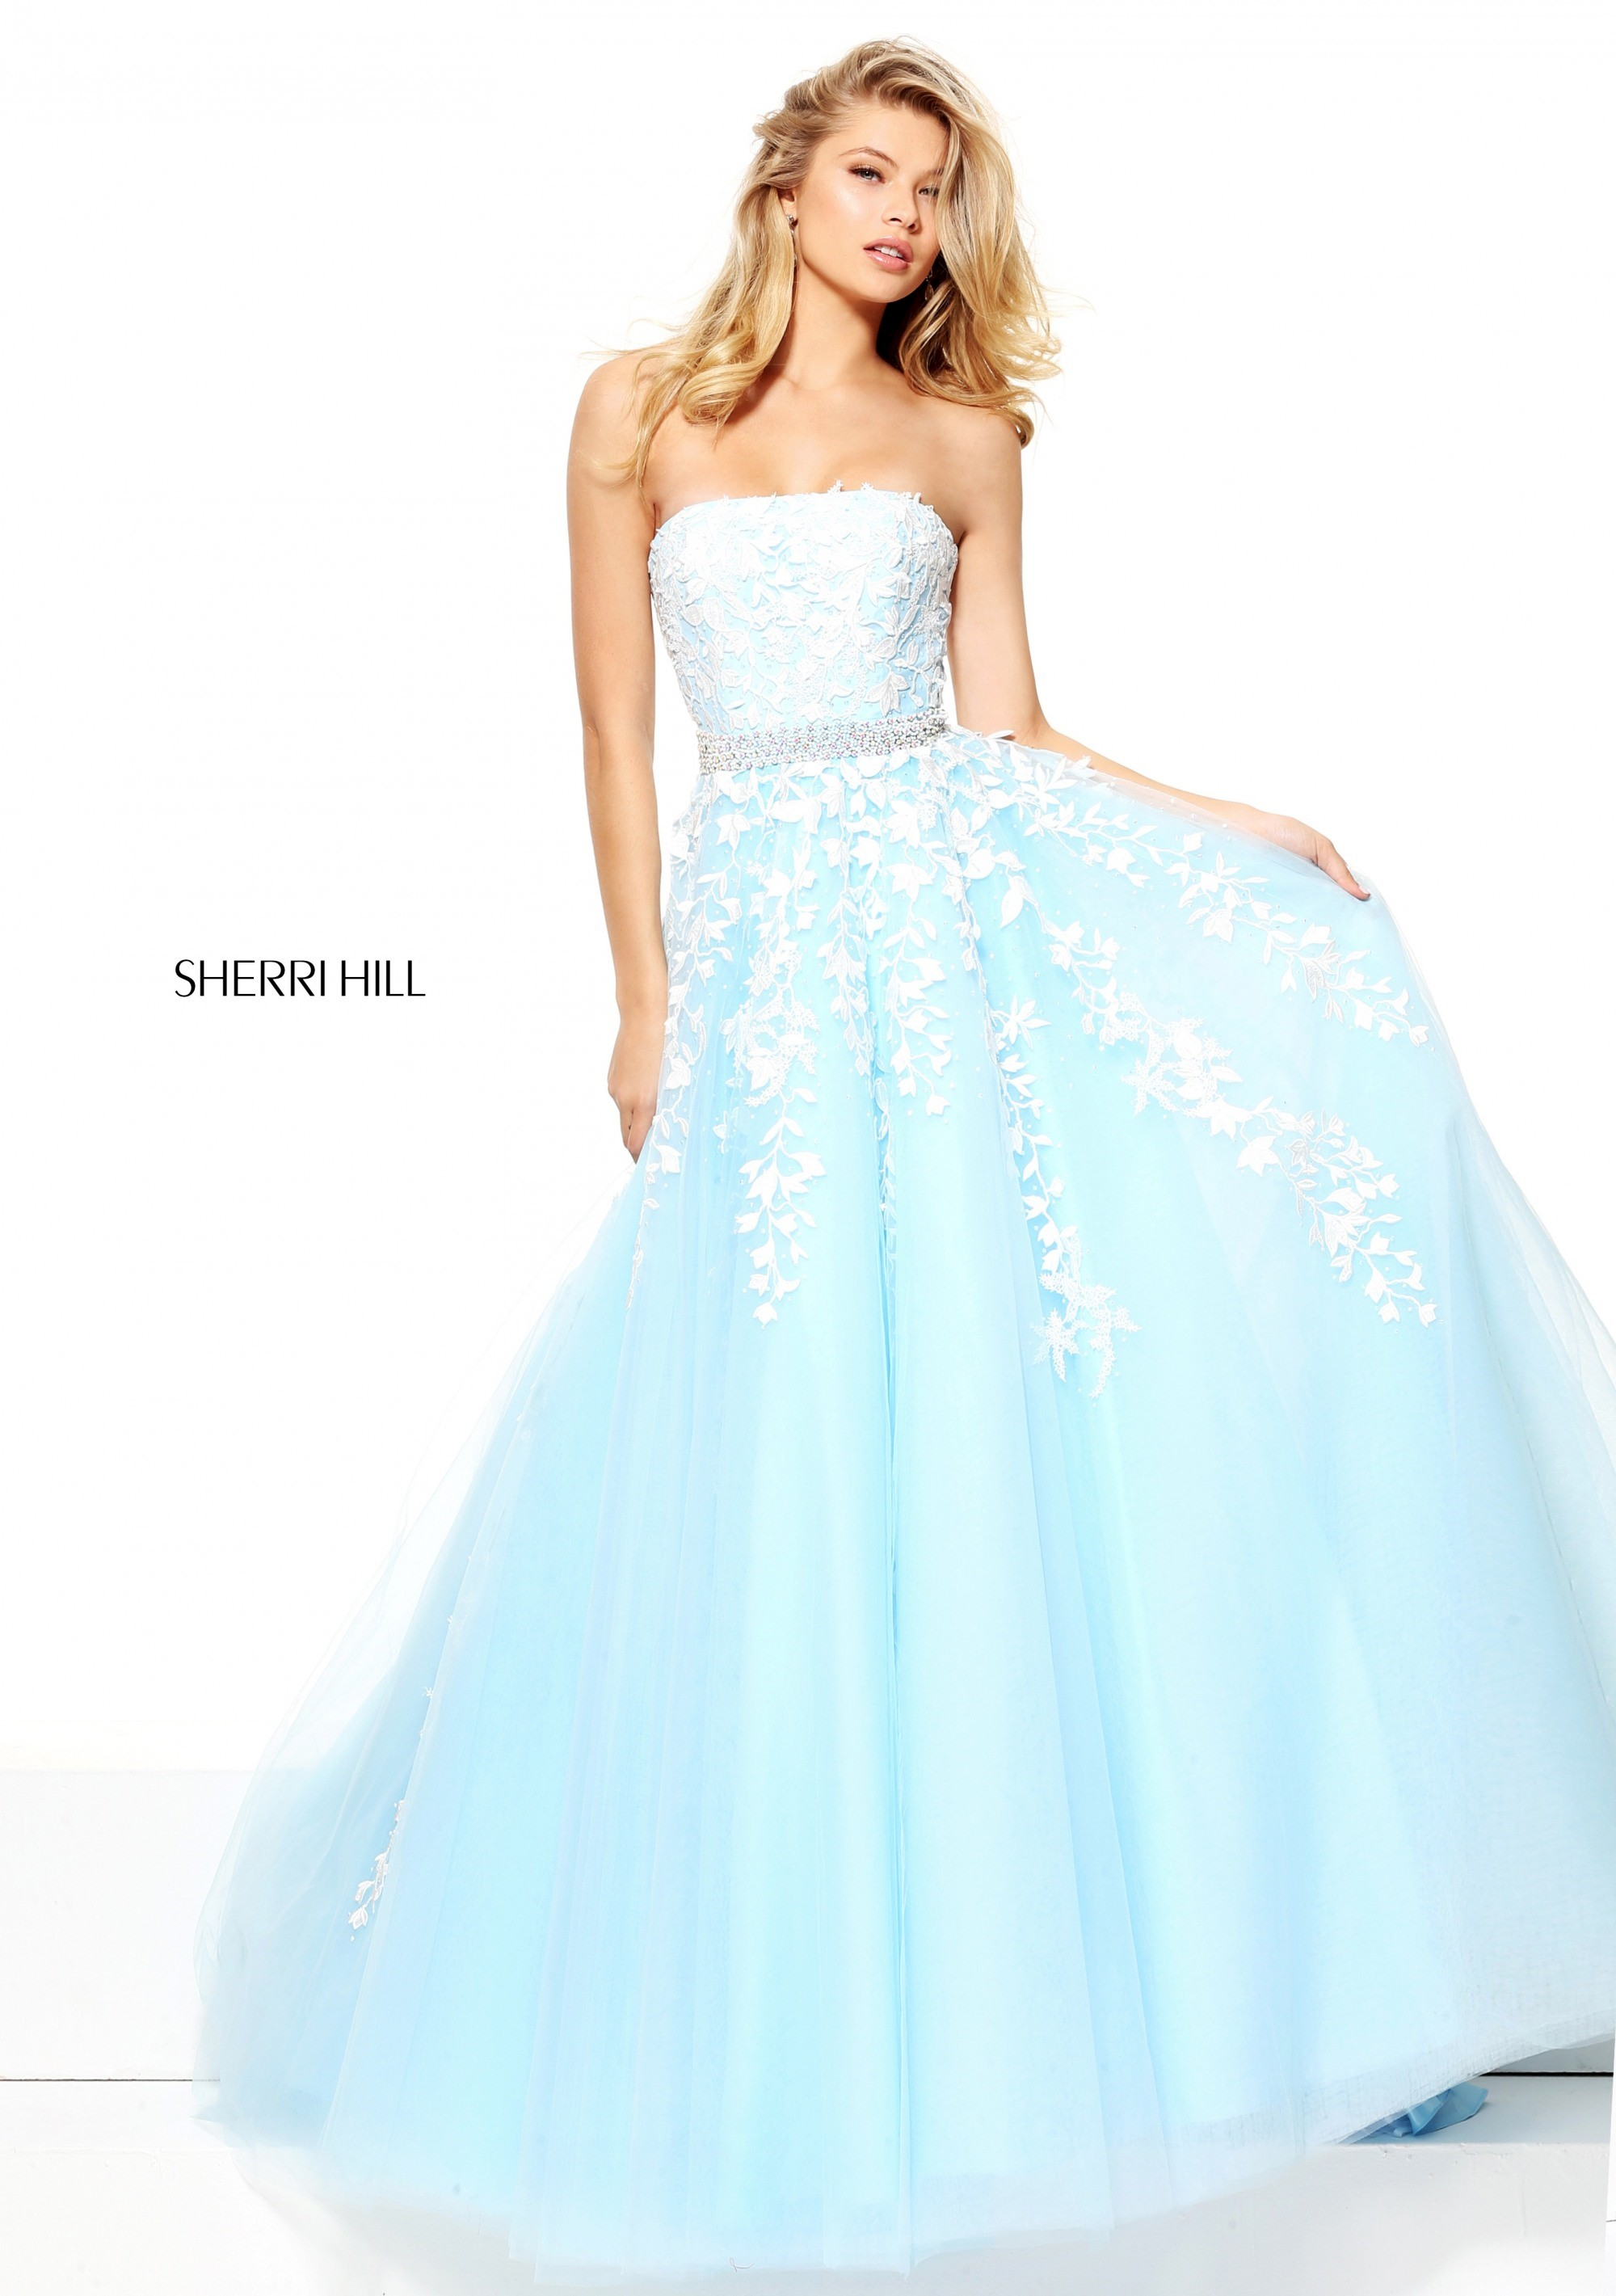 Shop Sherri Hill dresses at The Ultimate in Peabody, Massachusetts ...